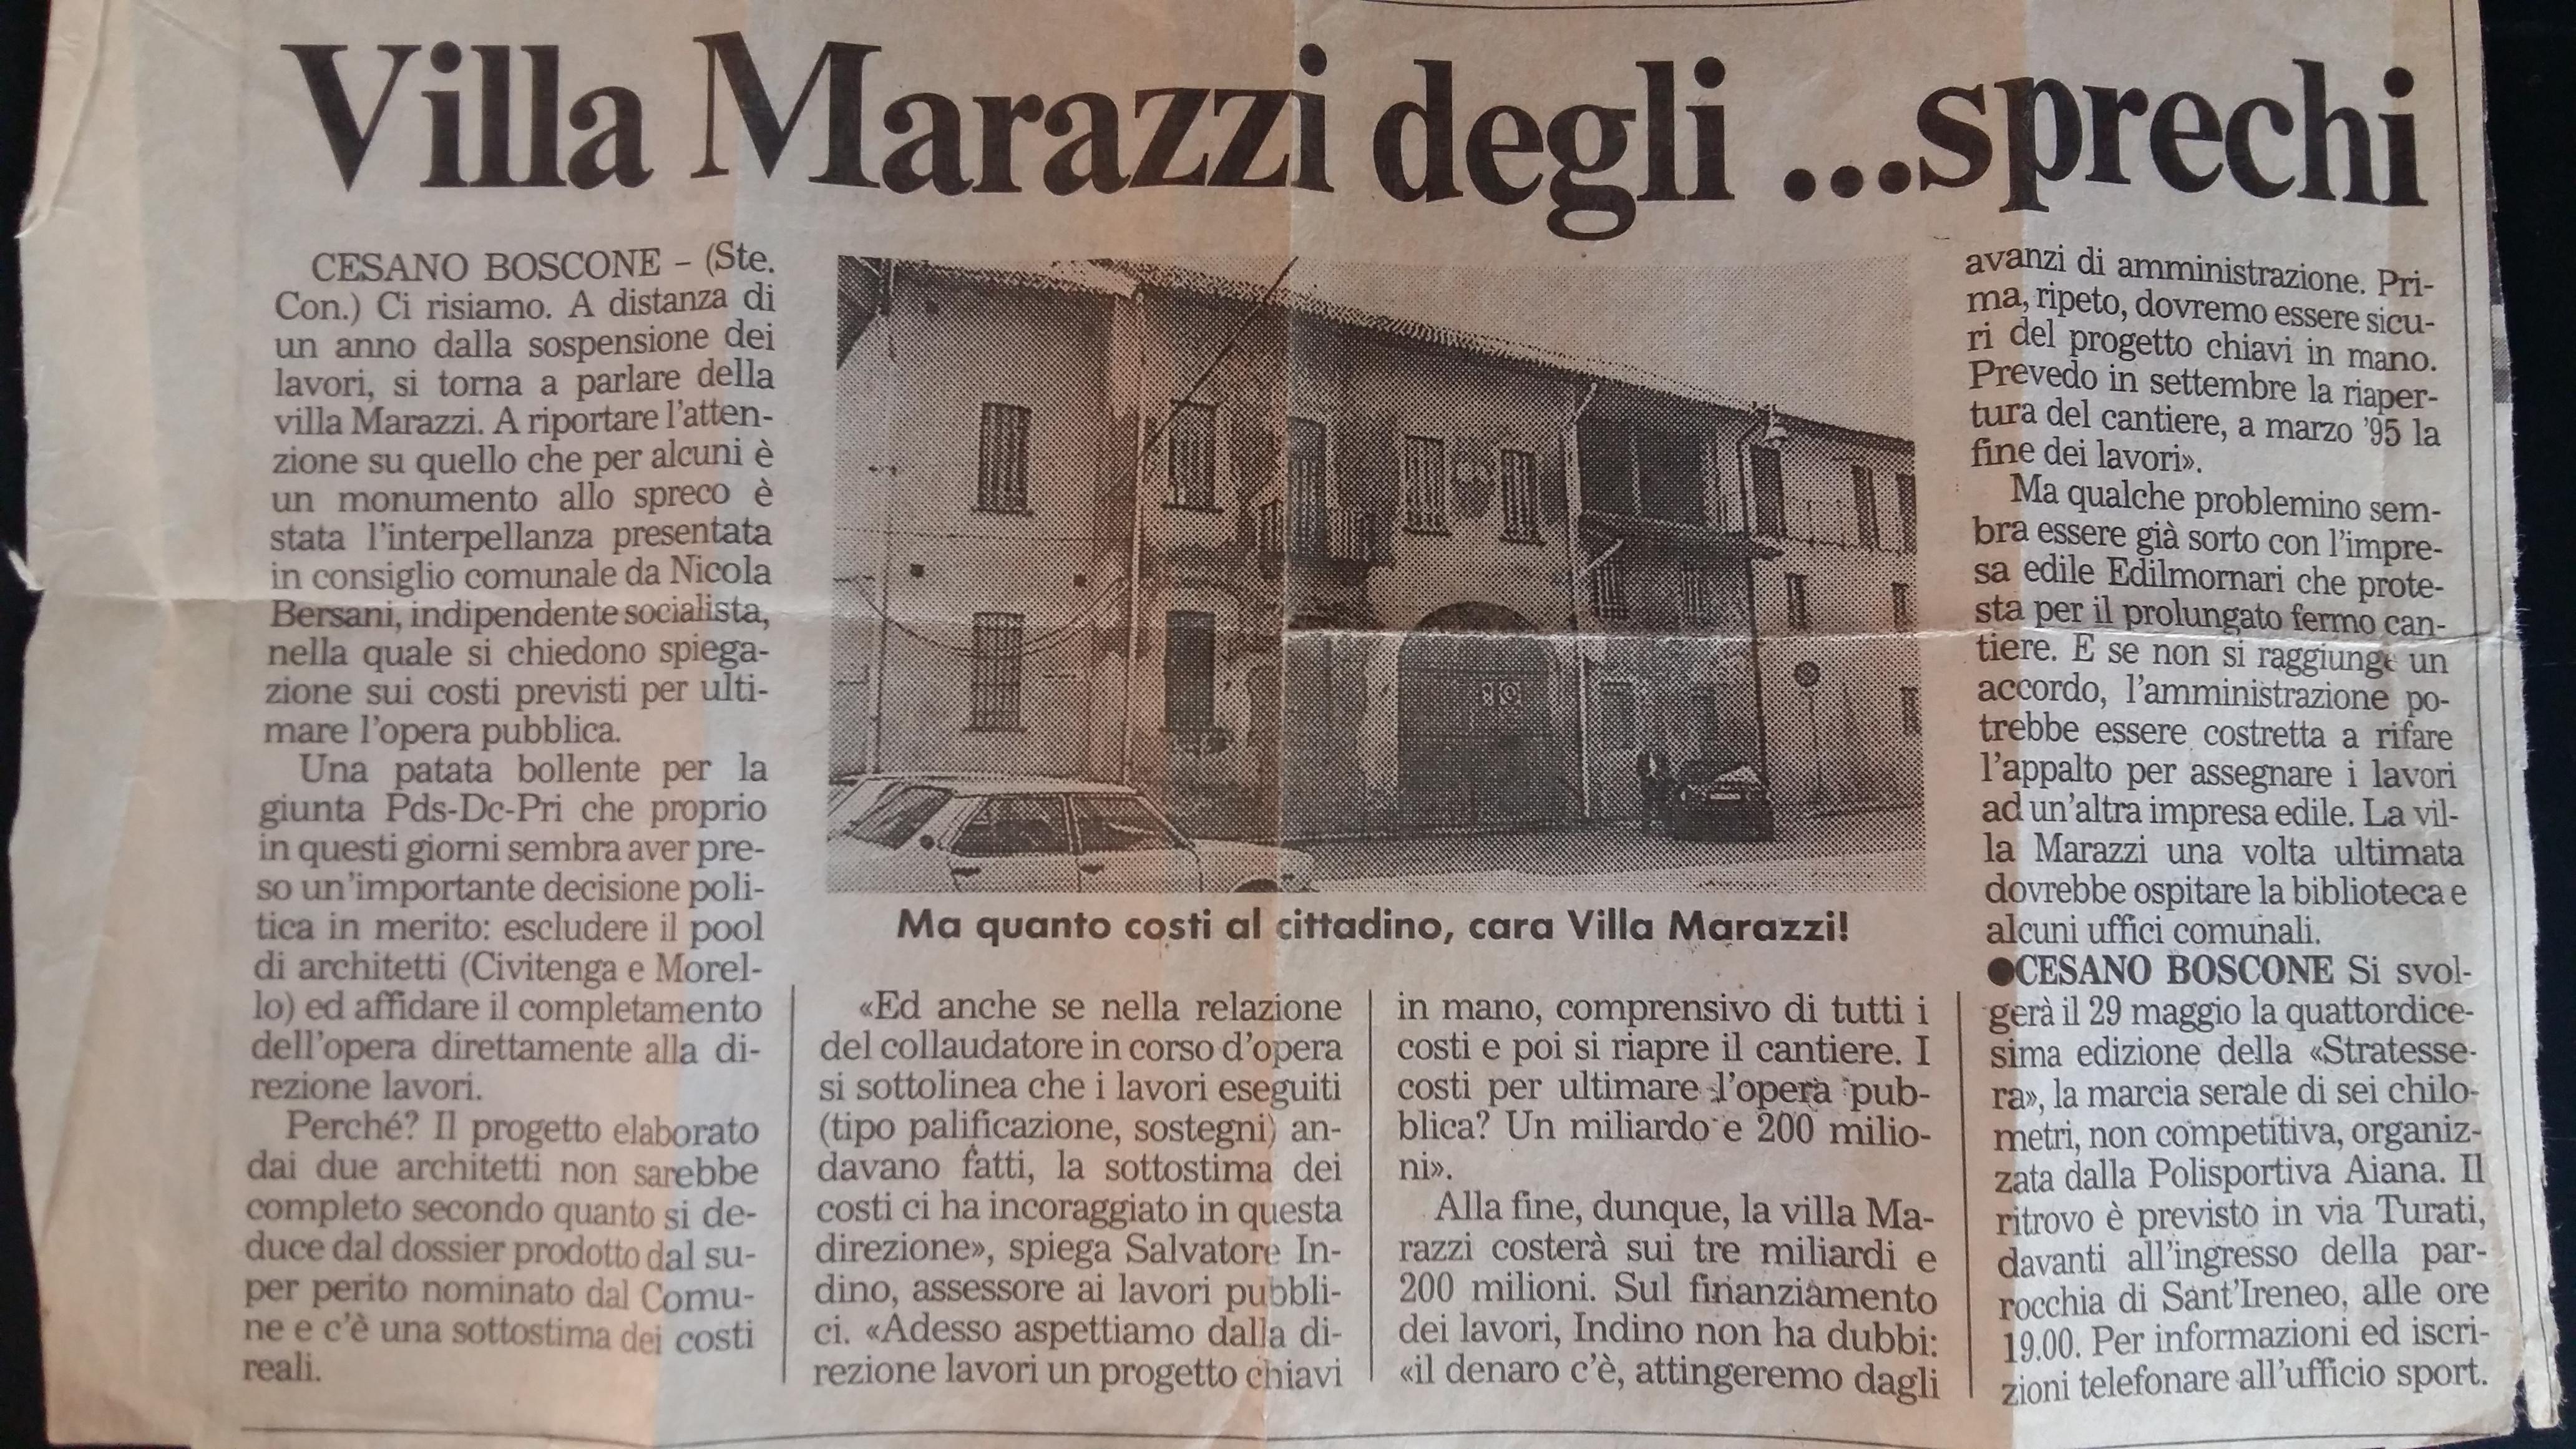 villa_marazzi_serve.jpg